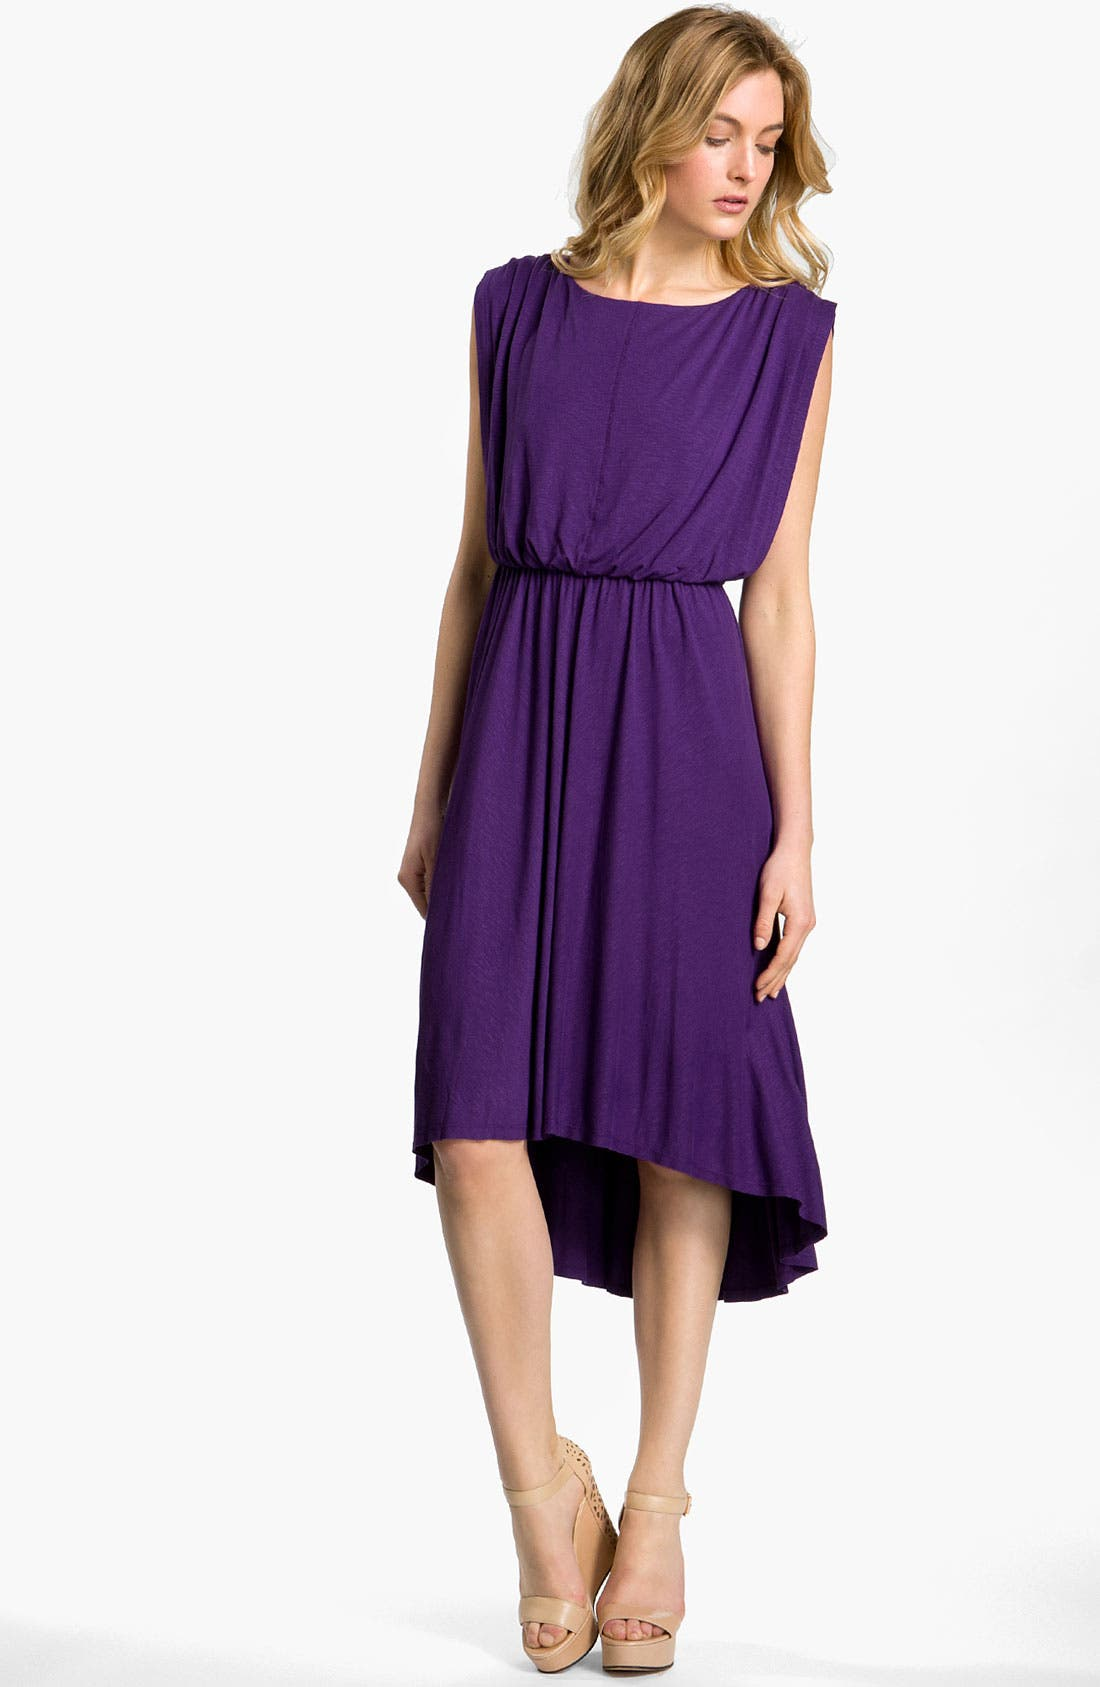 Main Image - Vince Camuto Blouson Jersey Dress